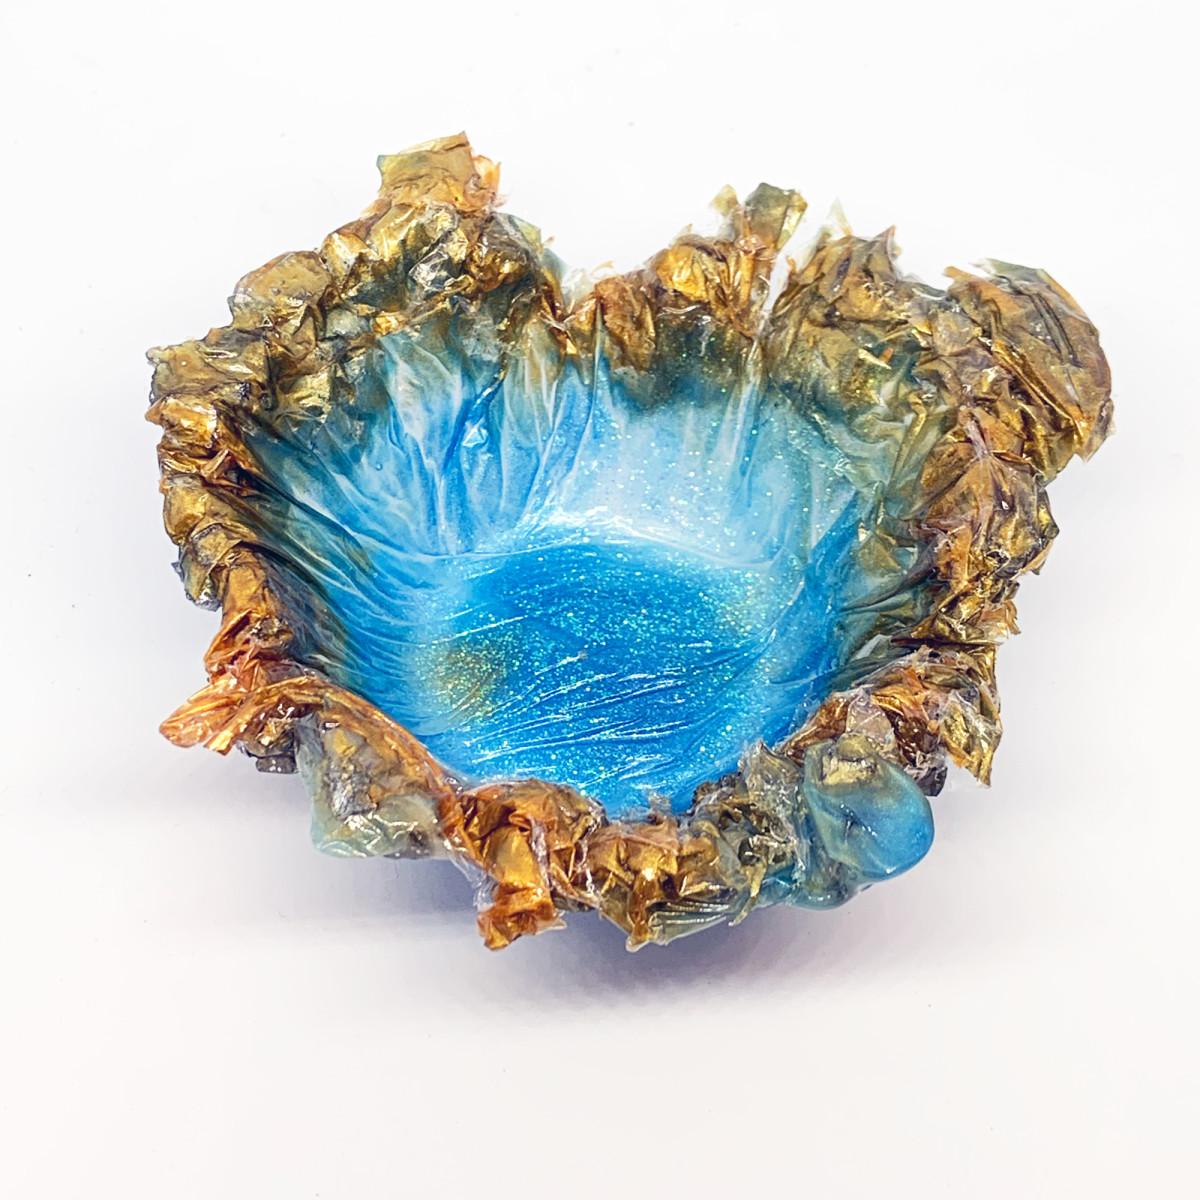 Resin Sculpture Trinket Bowl #2 by Susi Schuele